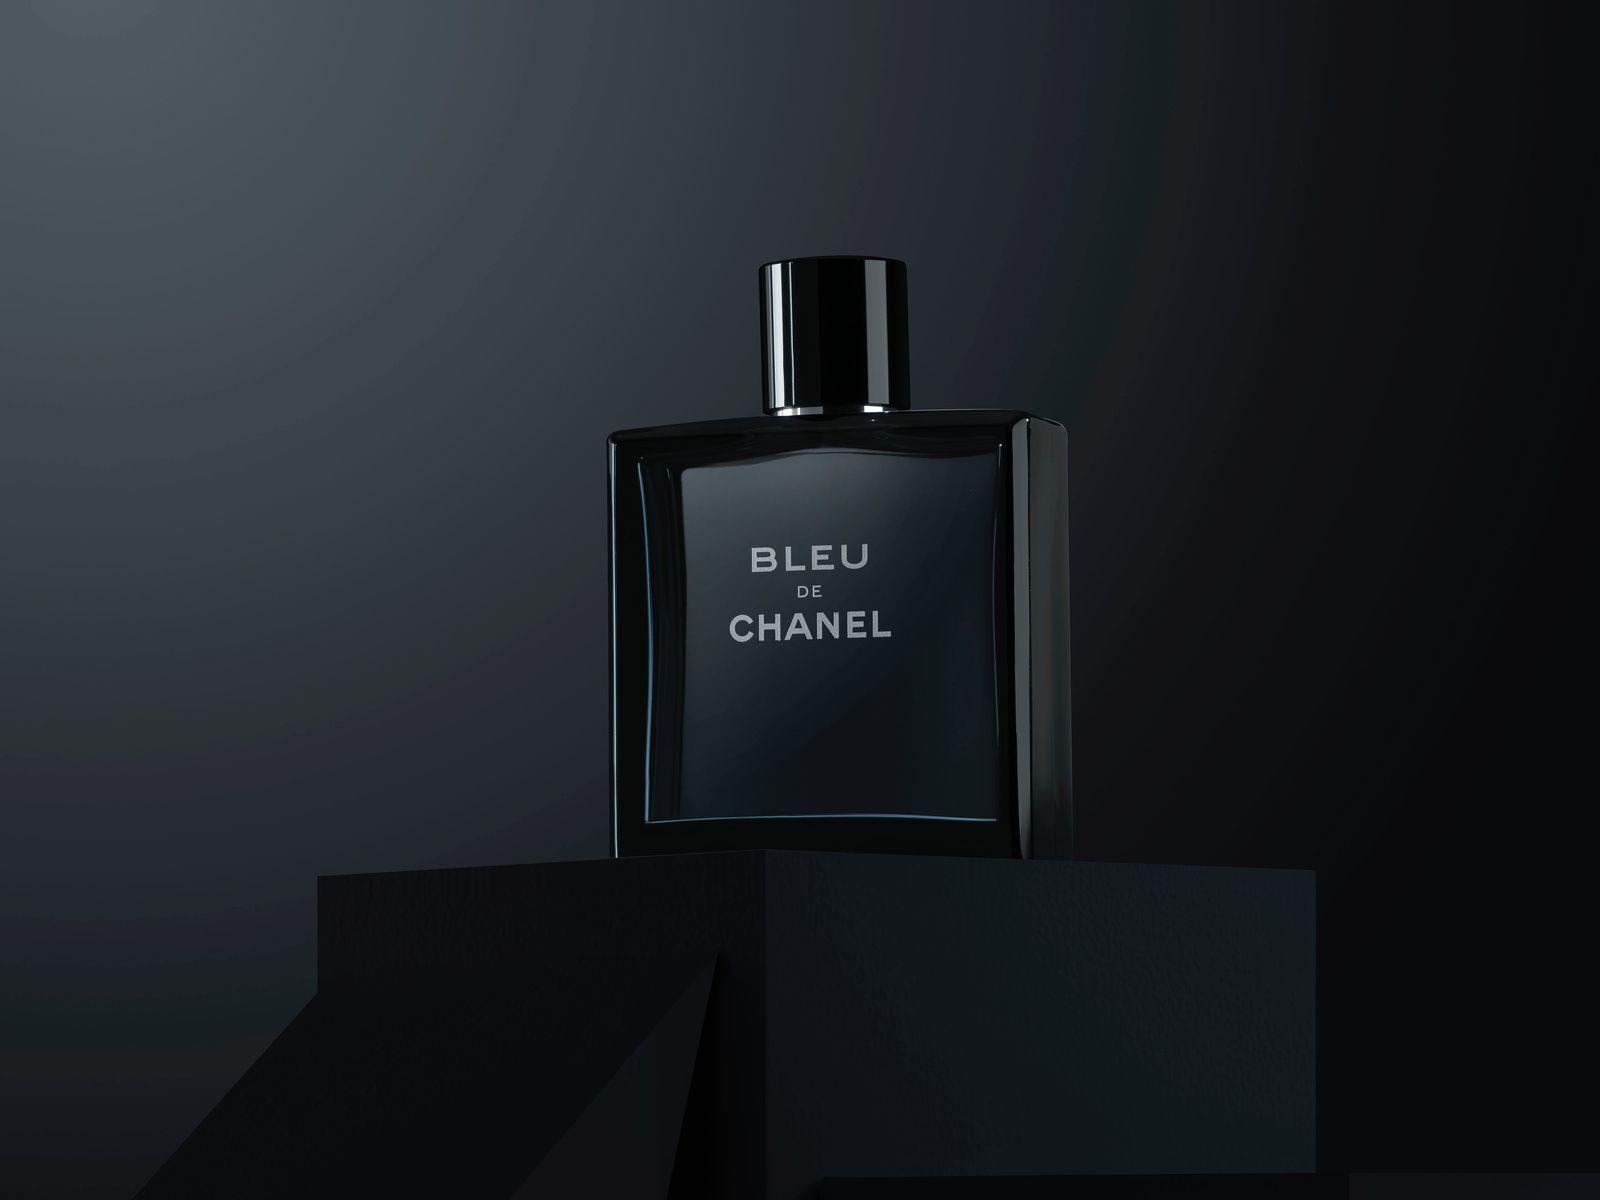 Fragrance Still Life Photography Cosmetic Fragrance Perfume